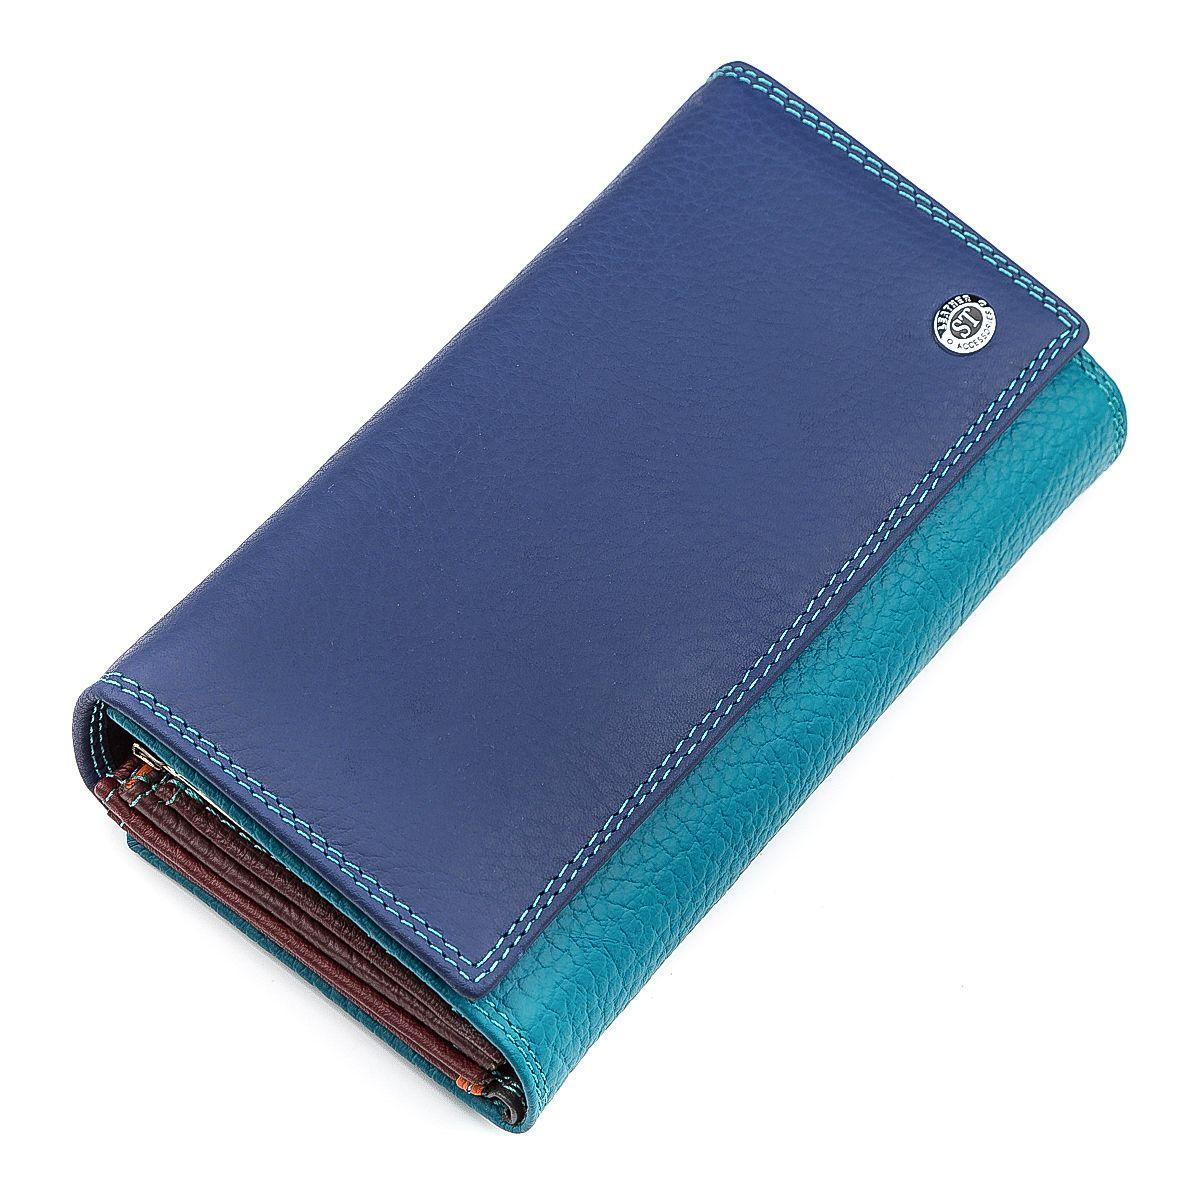 Кошелек женский ST Leather 18413 (SB46) кожа Синий